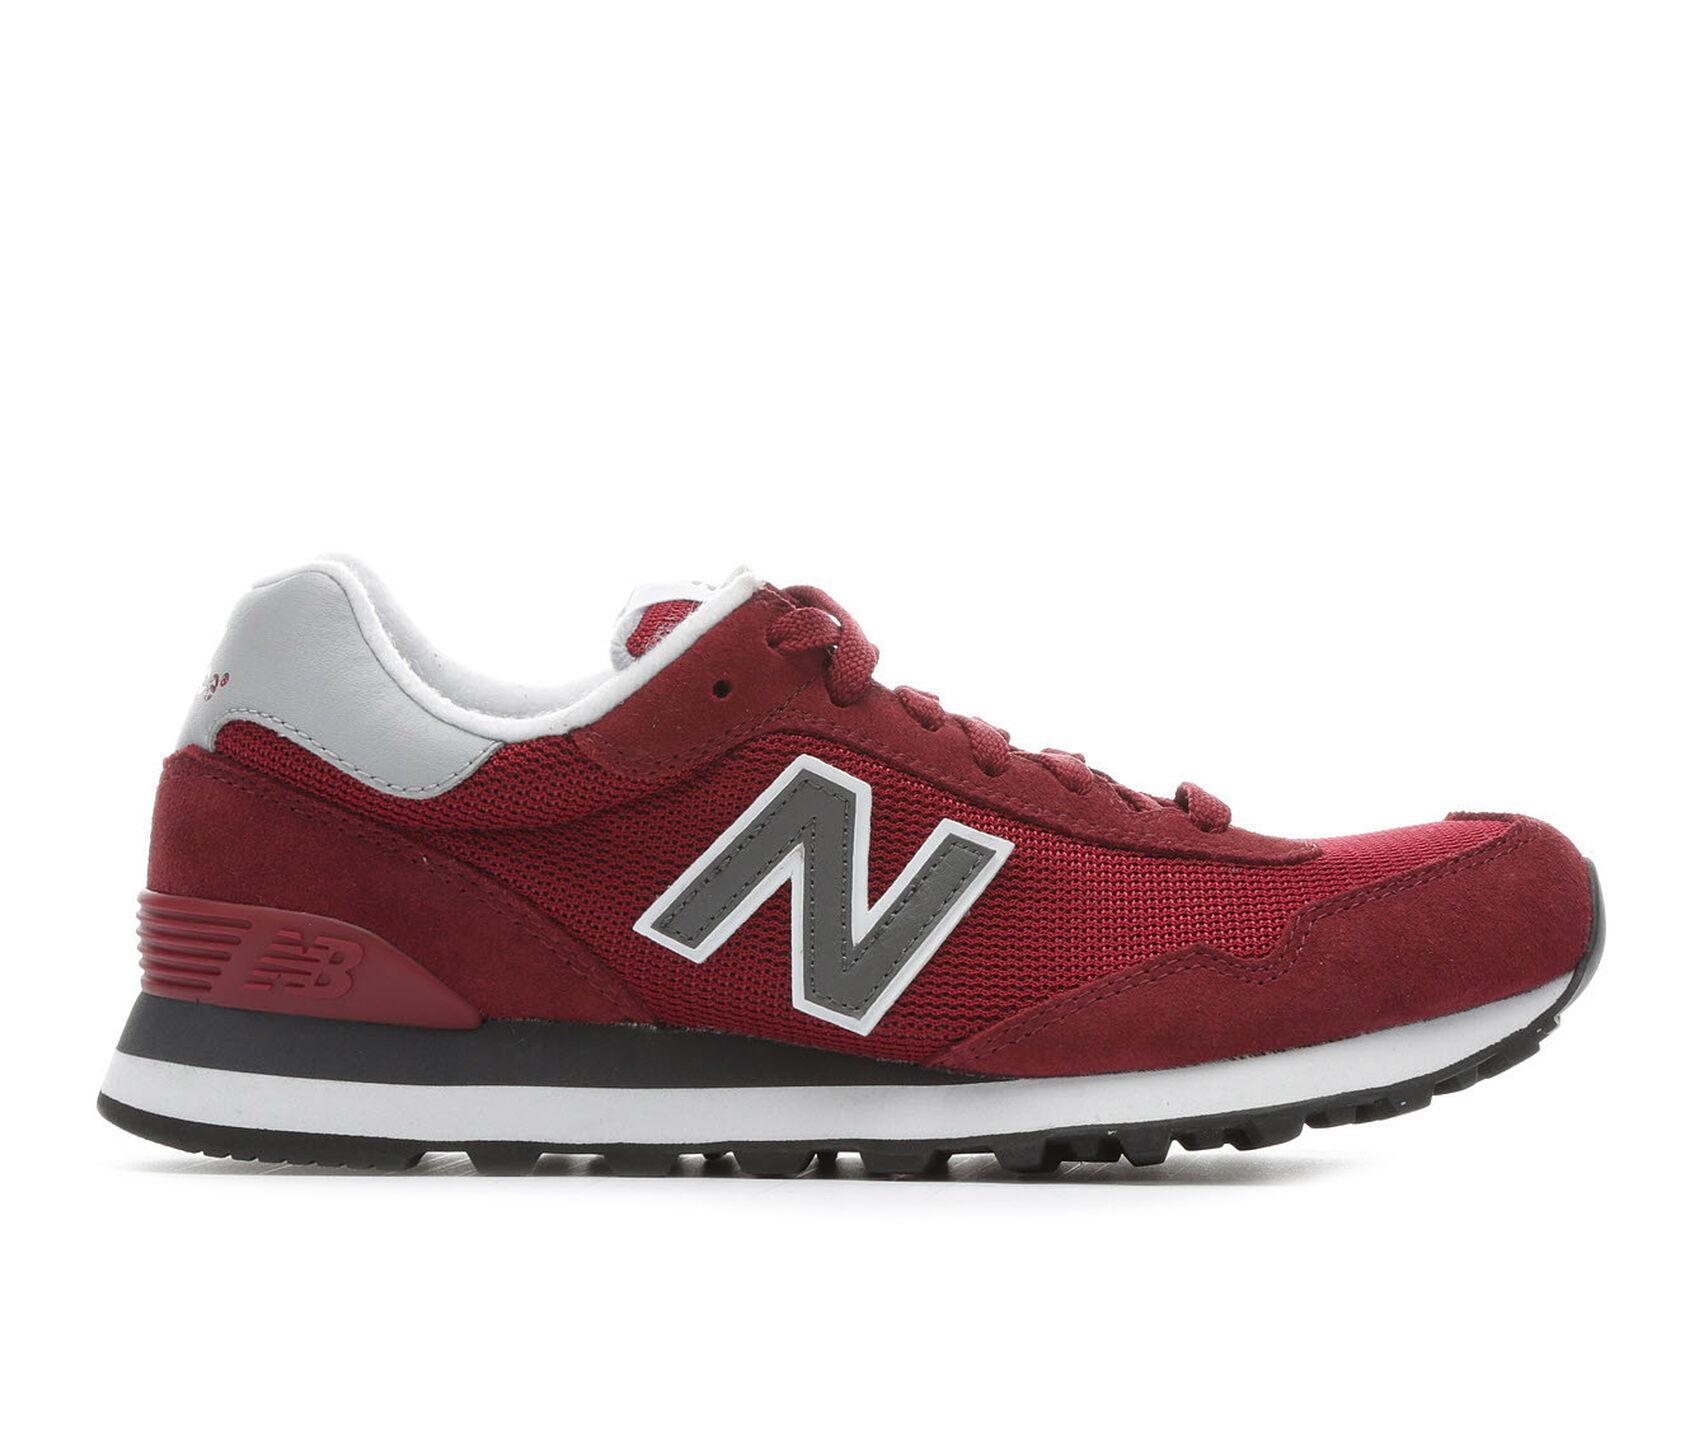 New Balance And Shoe Size Availability